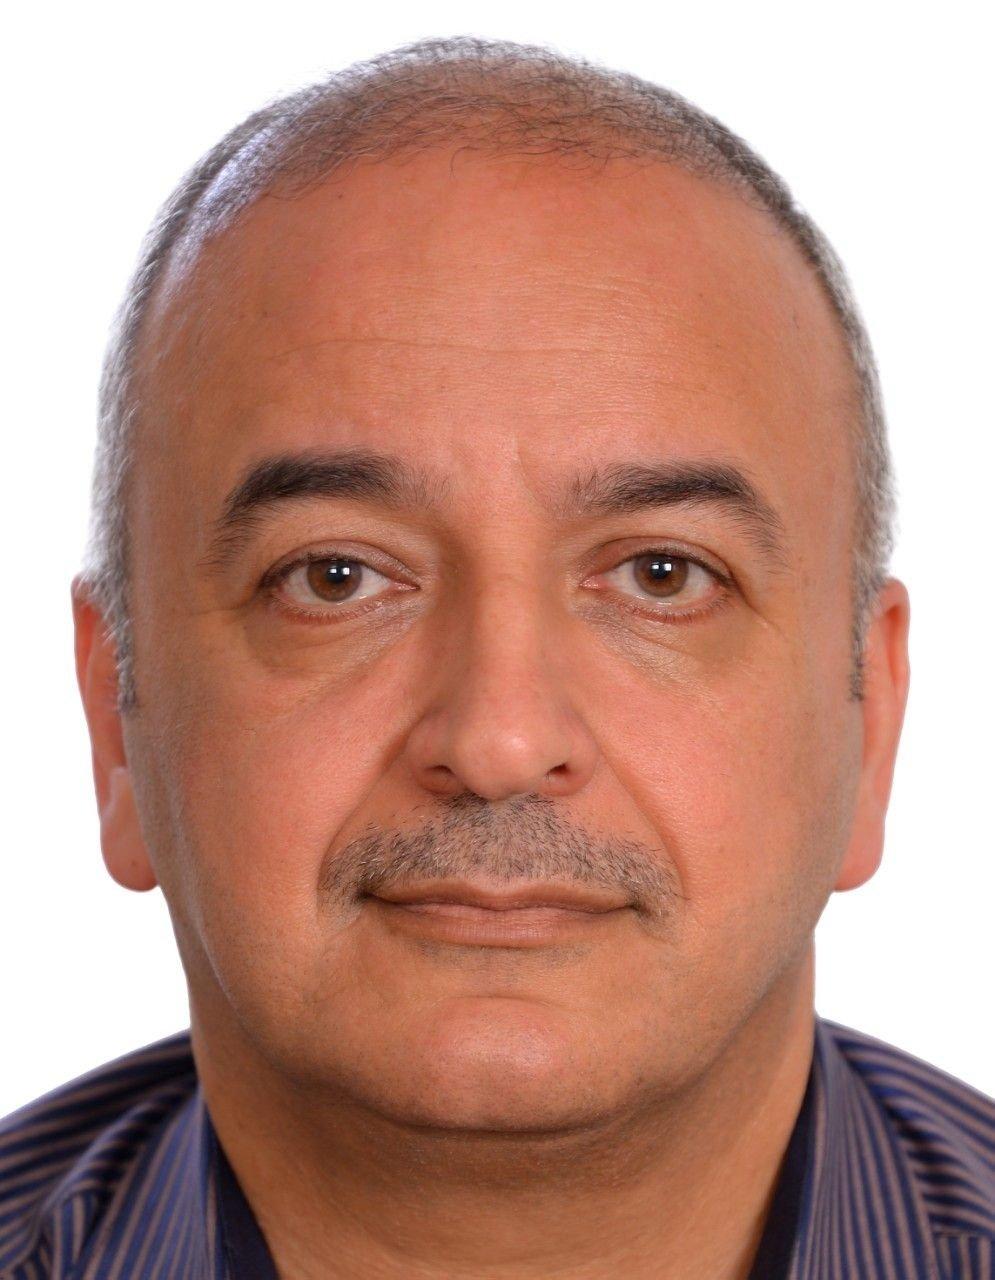 Qais Kadhum Baqir